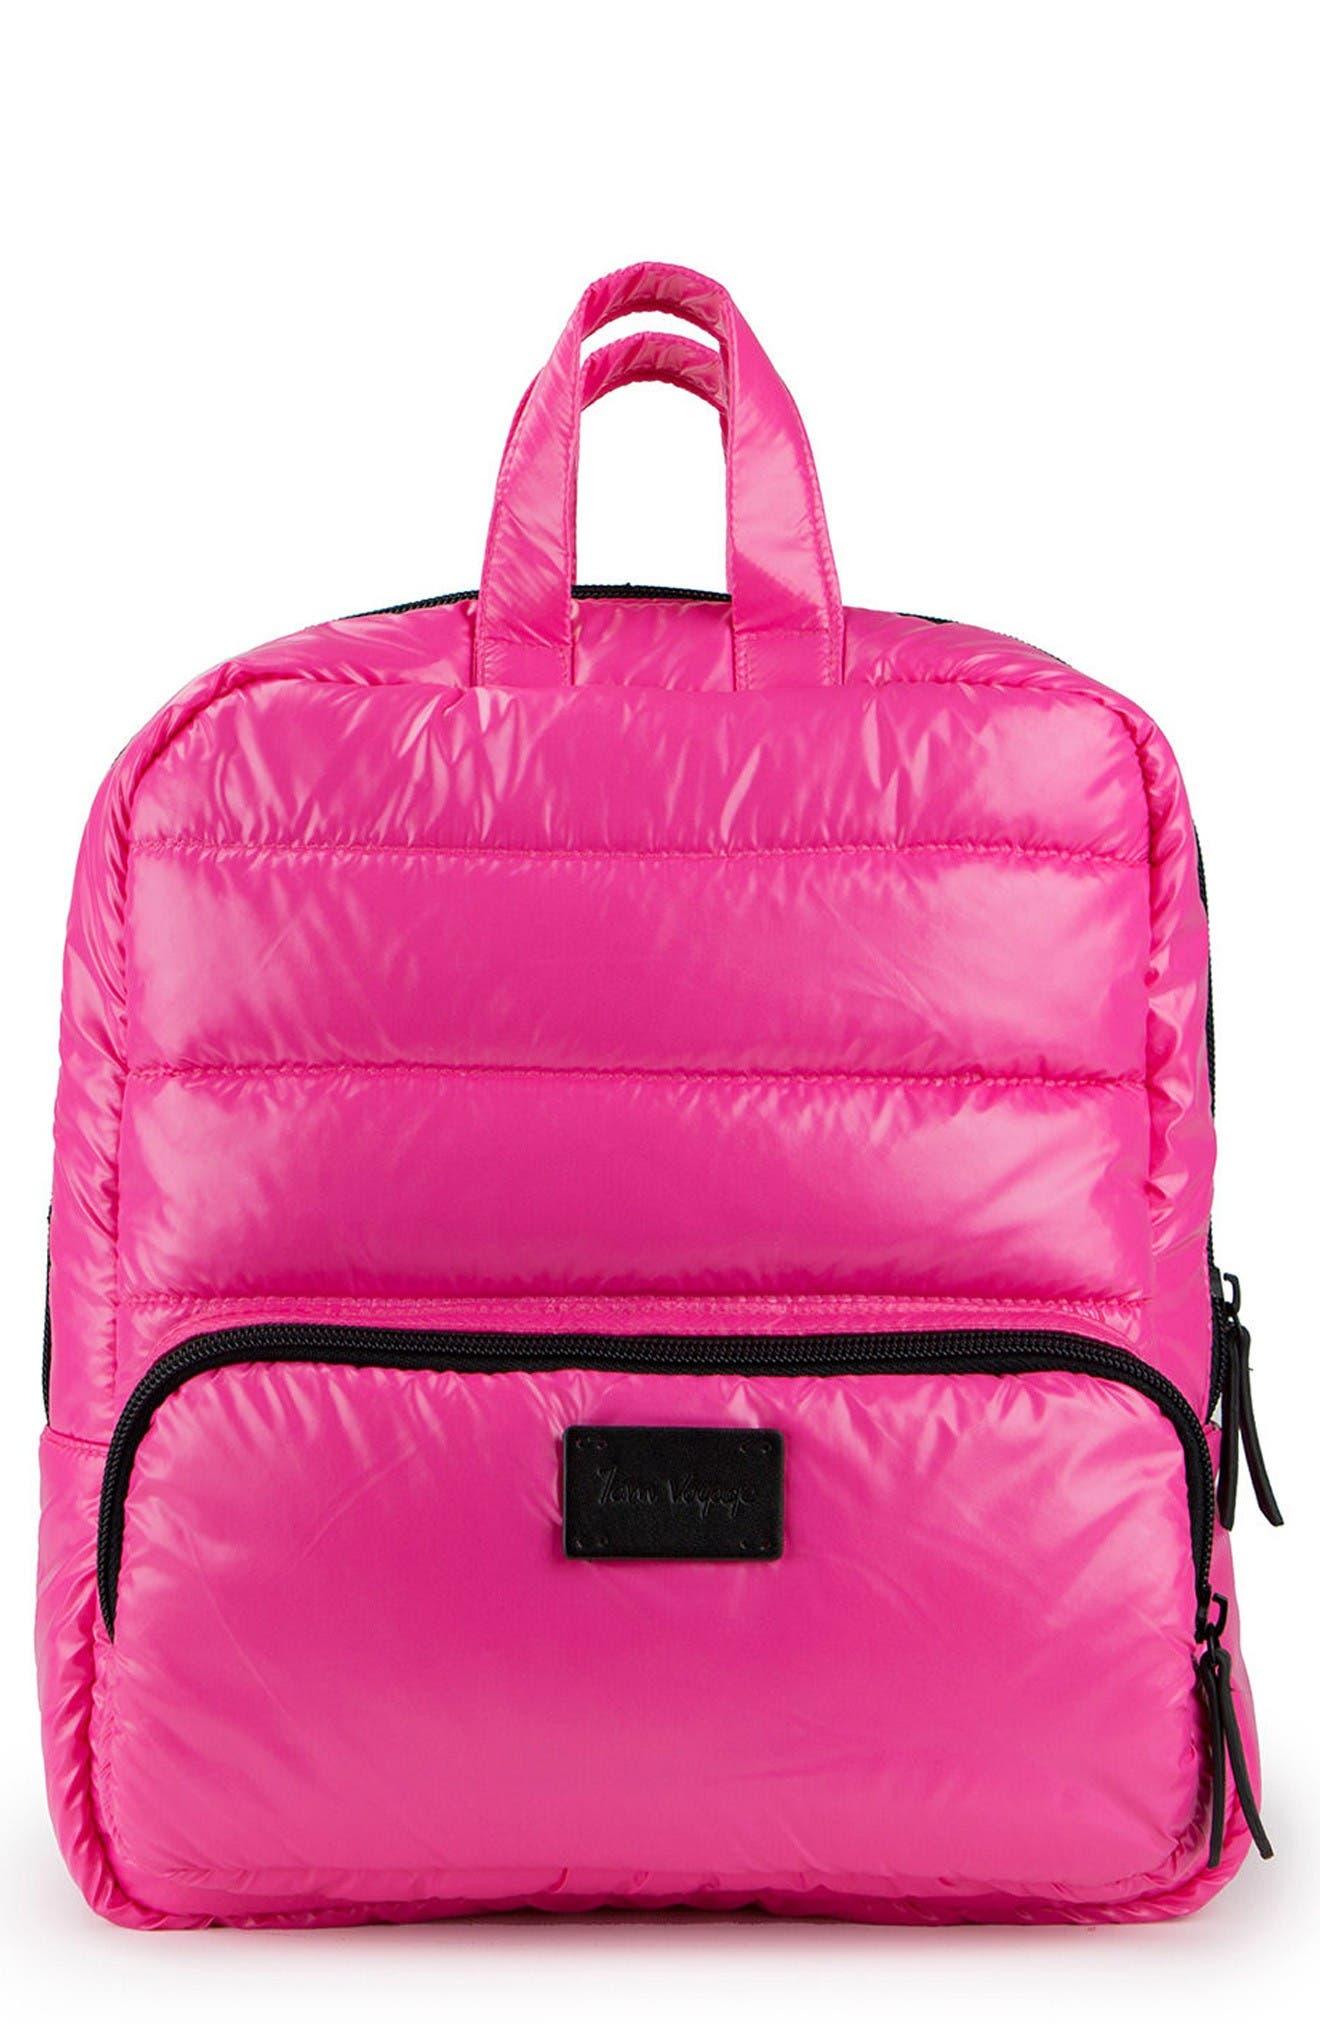 7 A.M. Enfant Mini Water Repellent Backpack (Kids)